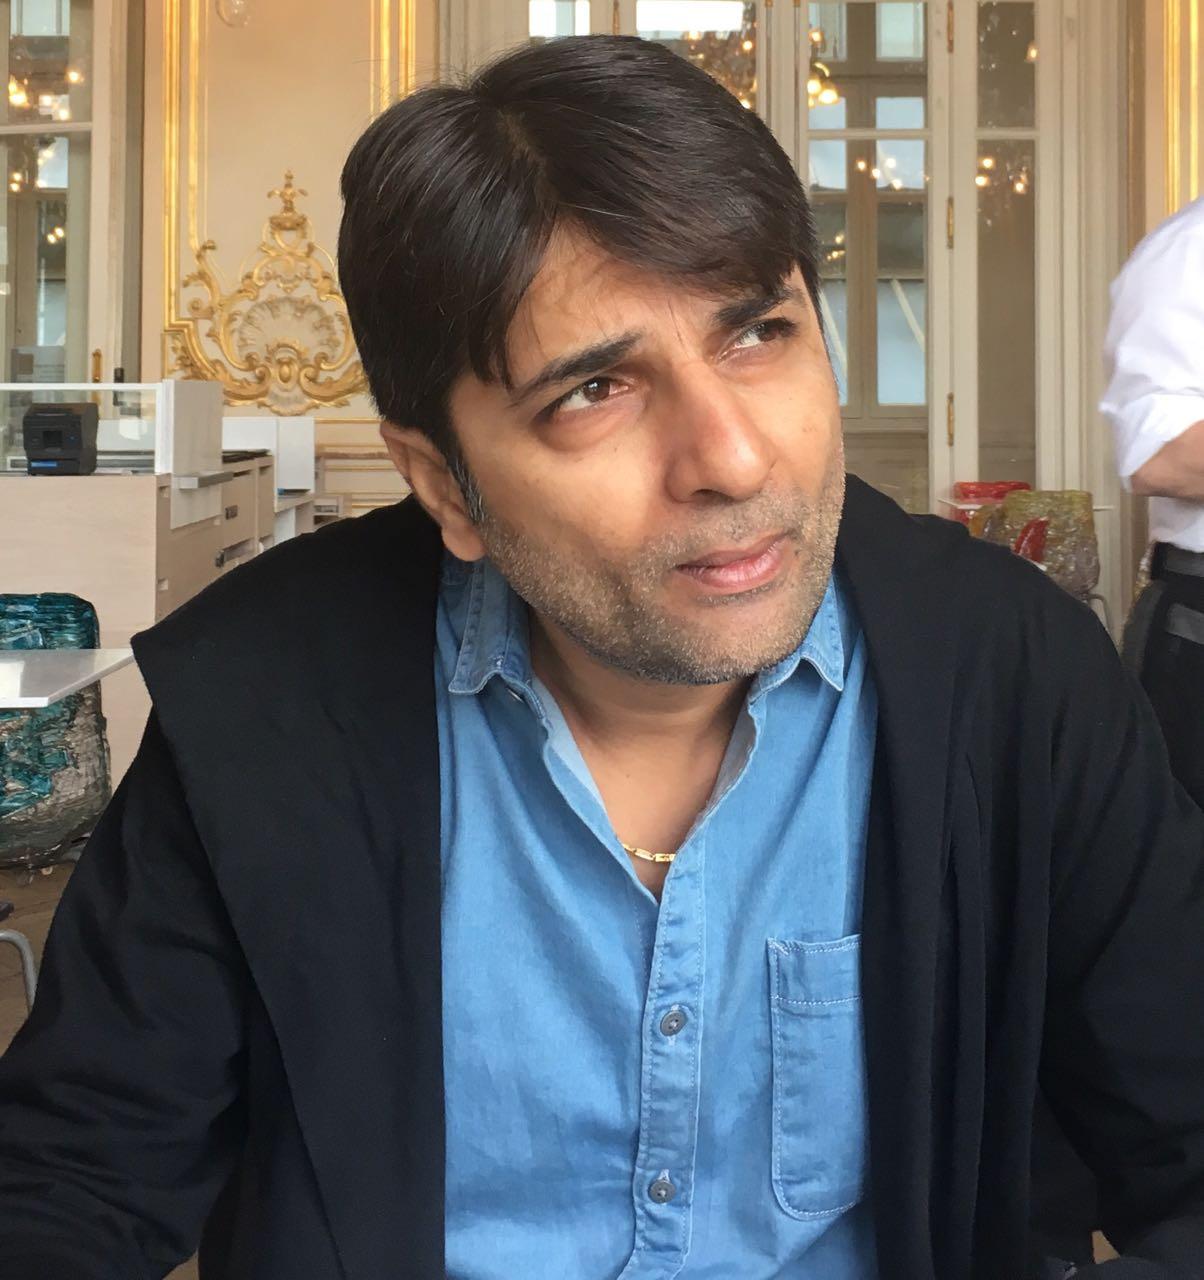 Director Vishal Mishra bags the 'Best New Age Film Director' Award at 10th Global Film Festival